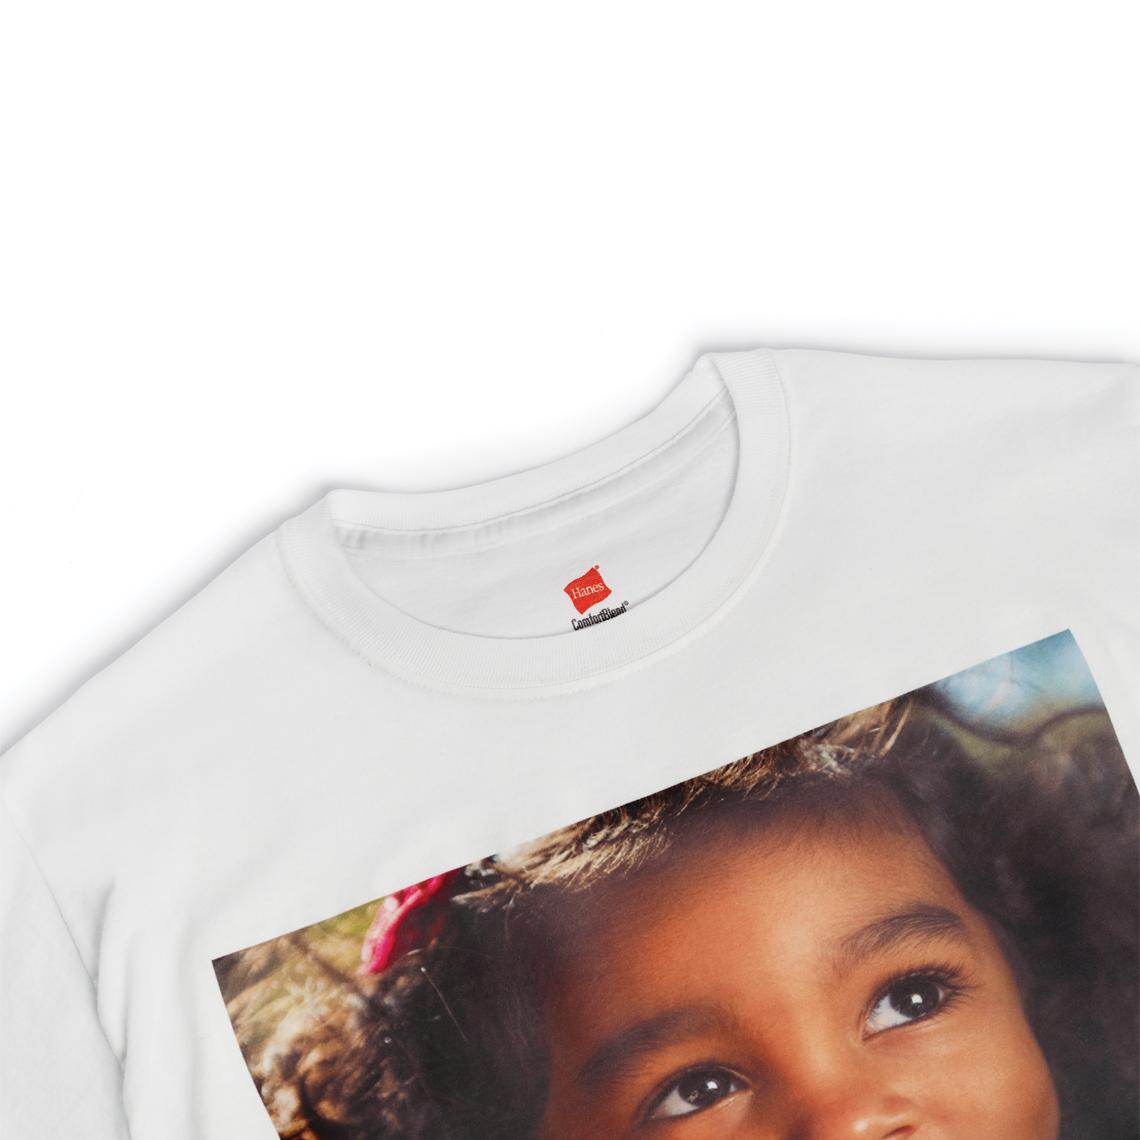 T shirt design evansville indiana - Photo T Shirt